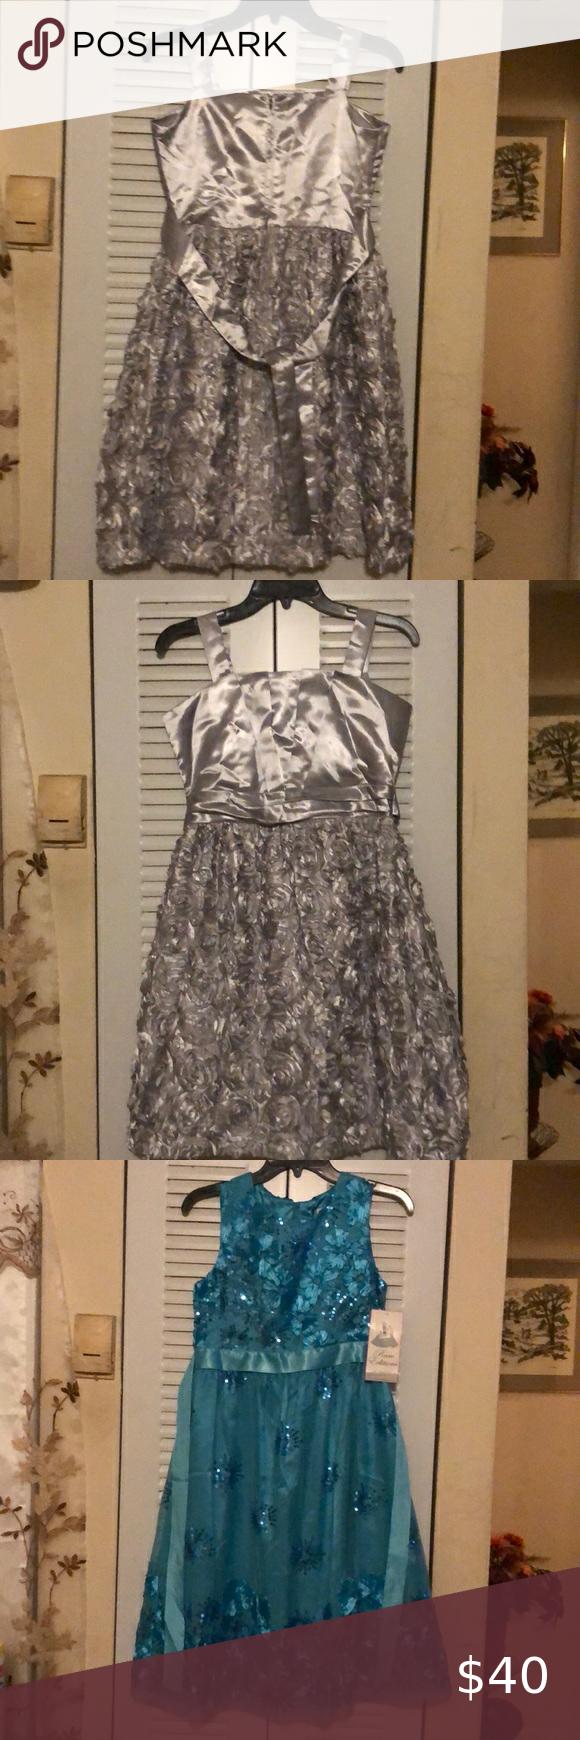 Dress Rare Editions Girls Size 10 Dresses Dress Size Chart Women Rare Editions Dress [ 1740 x 580 Pixel ]